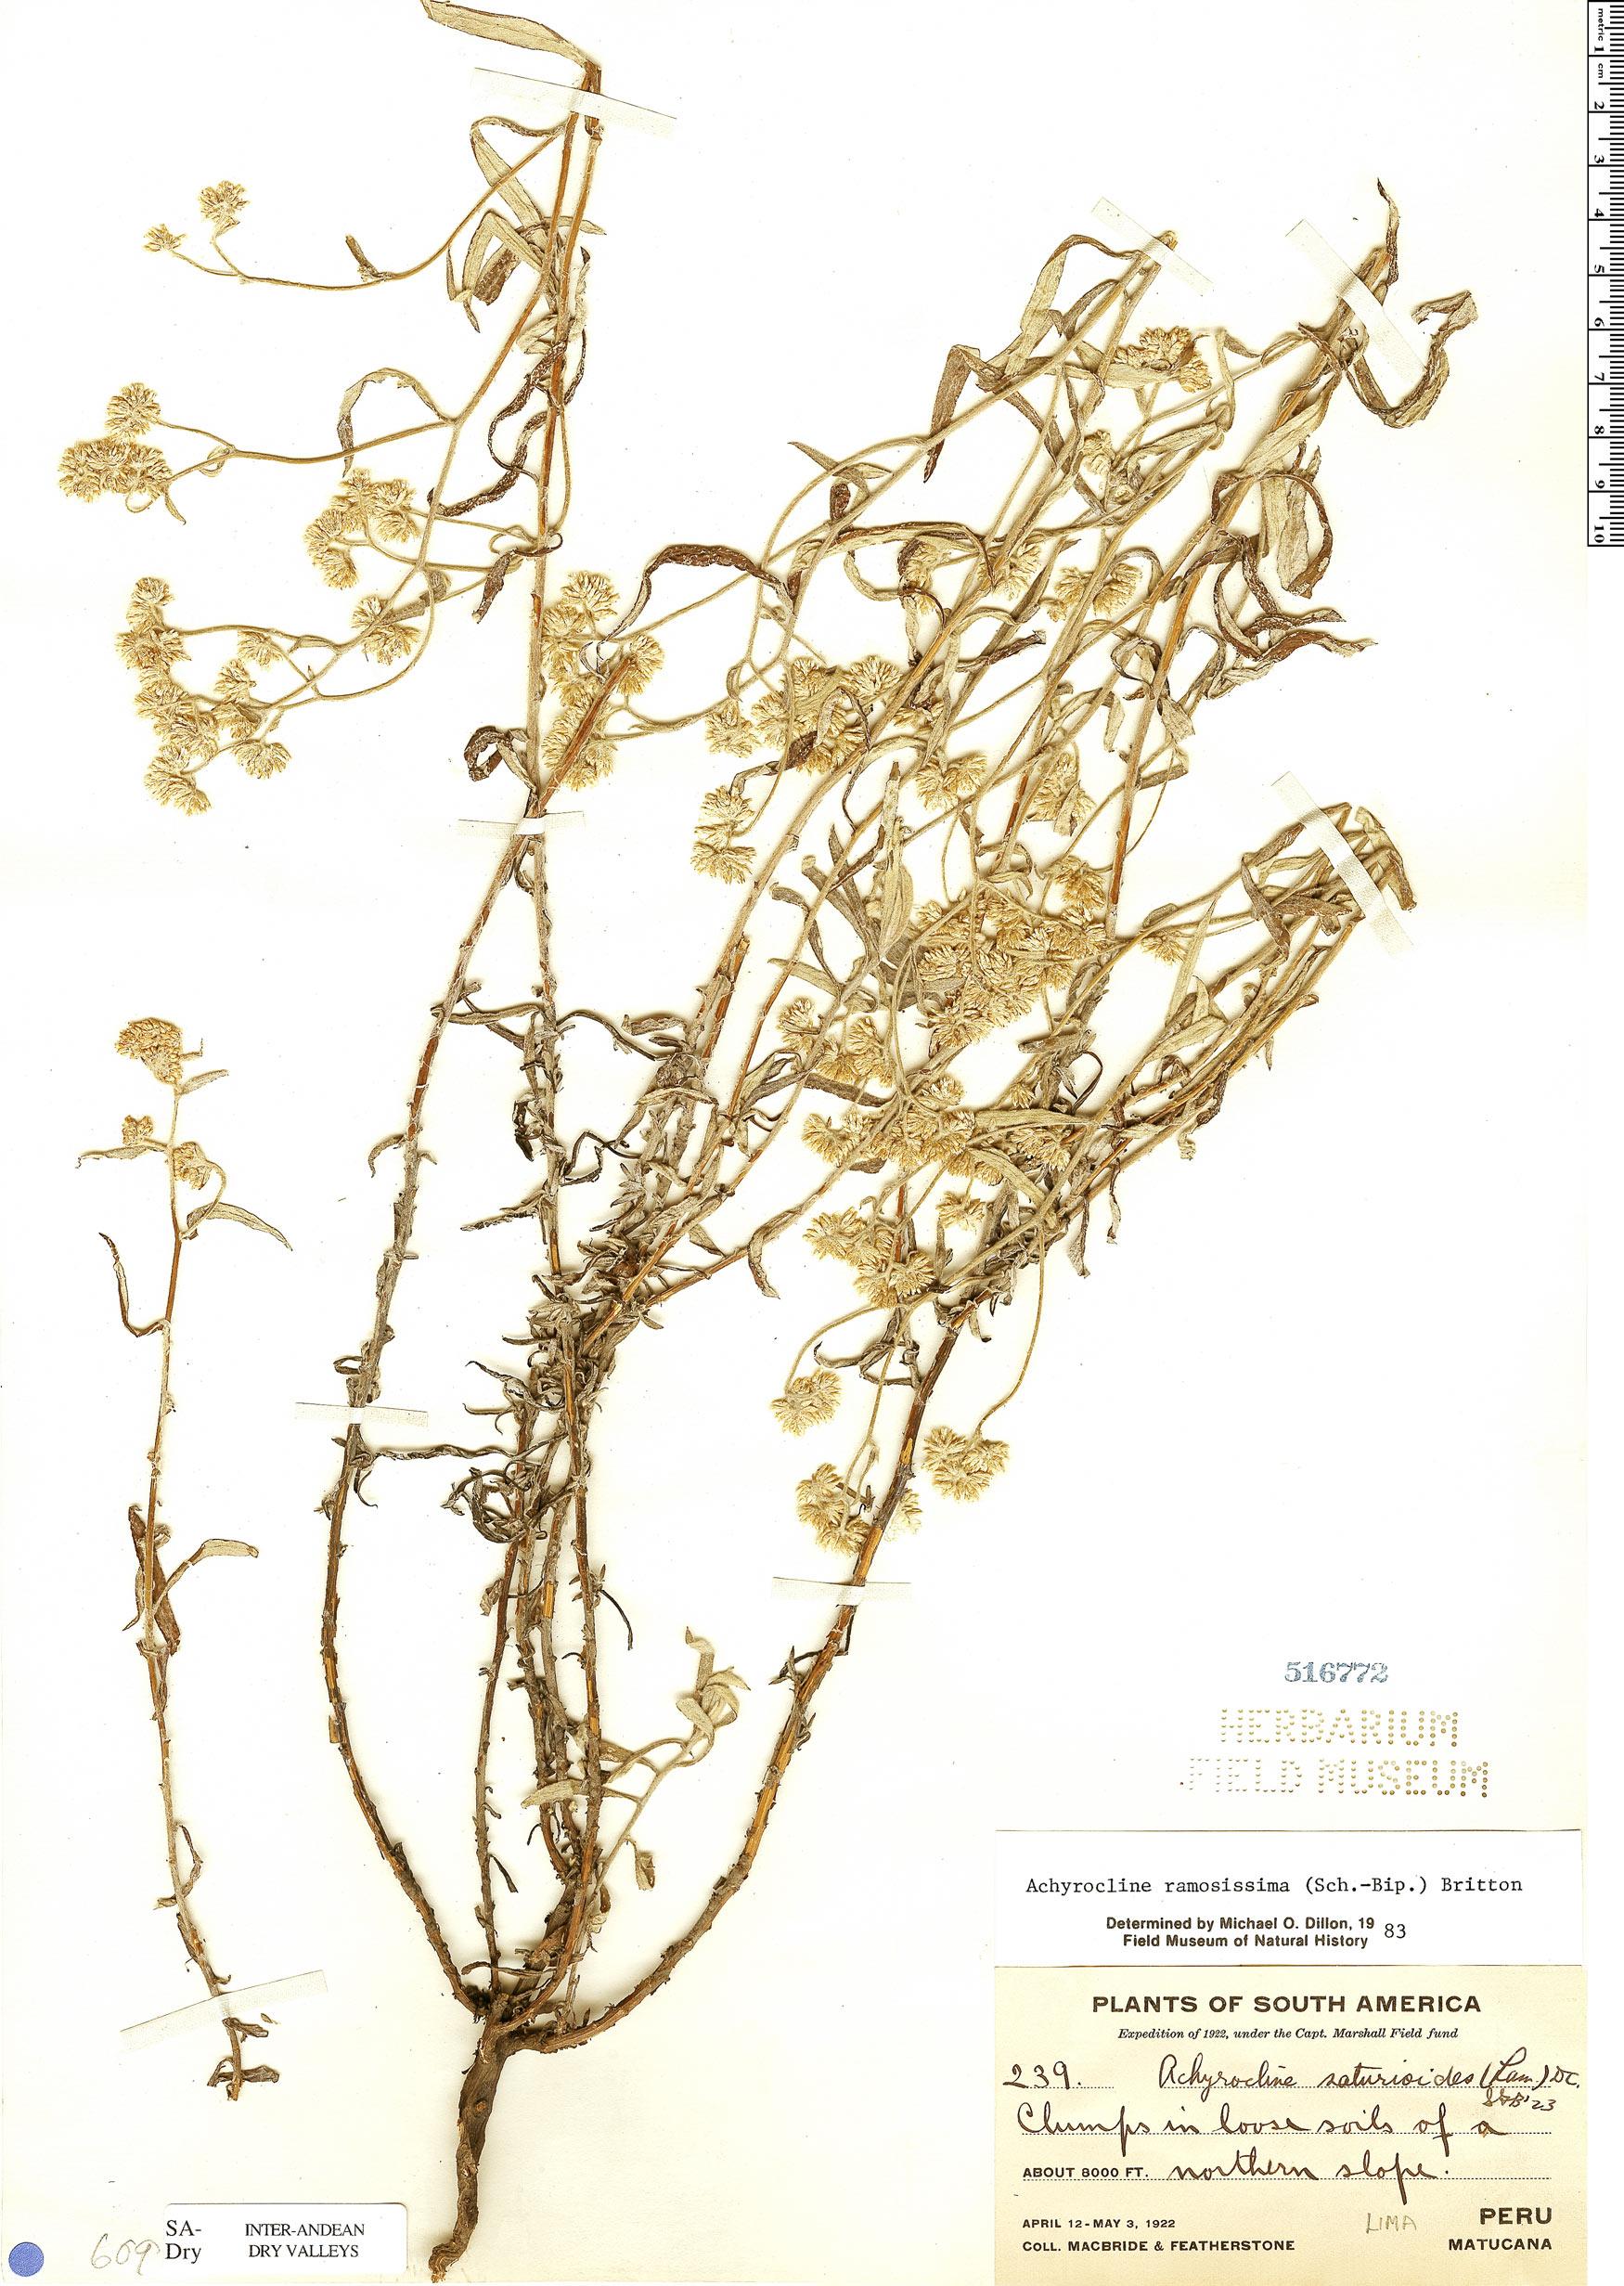 Specimen: Achyrocline ramosissima